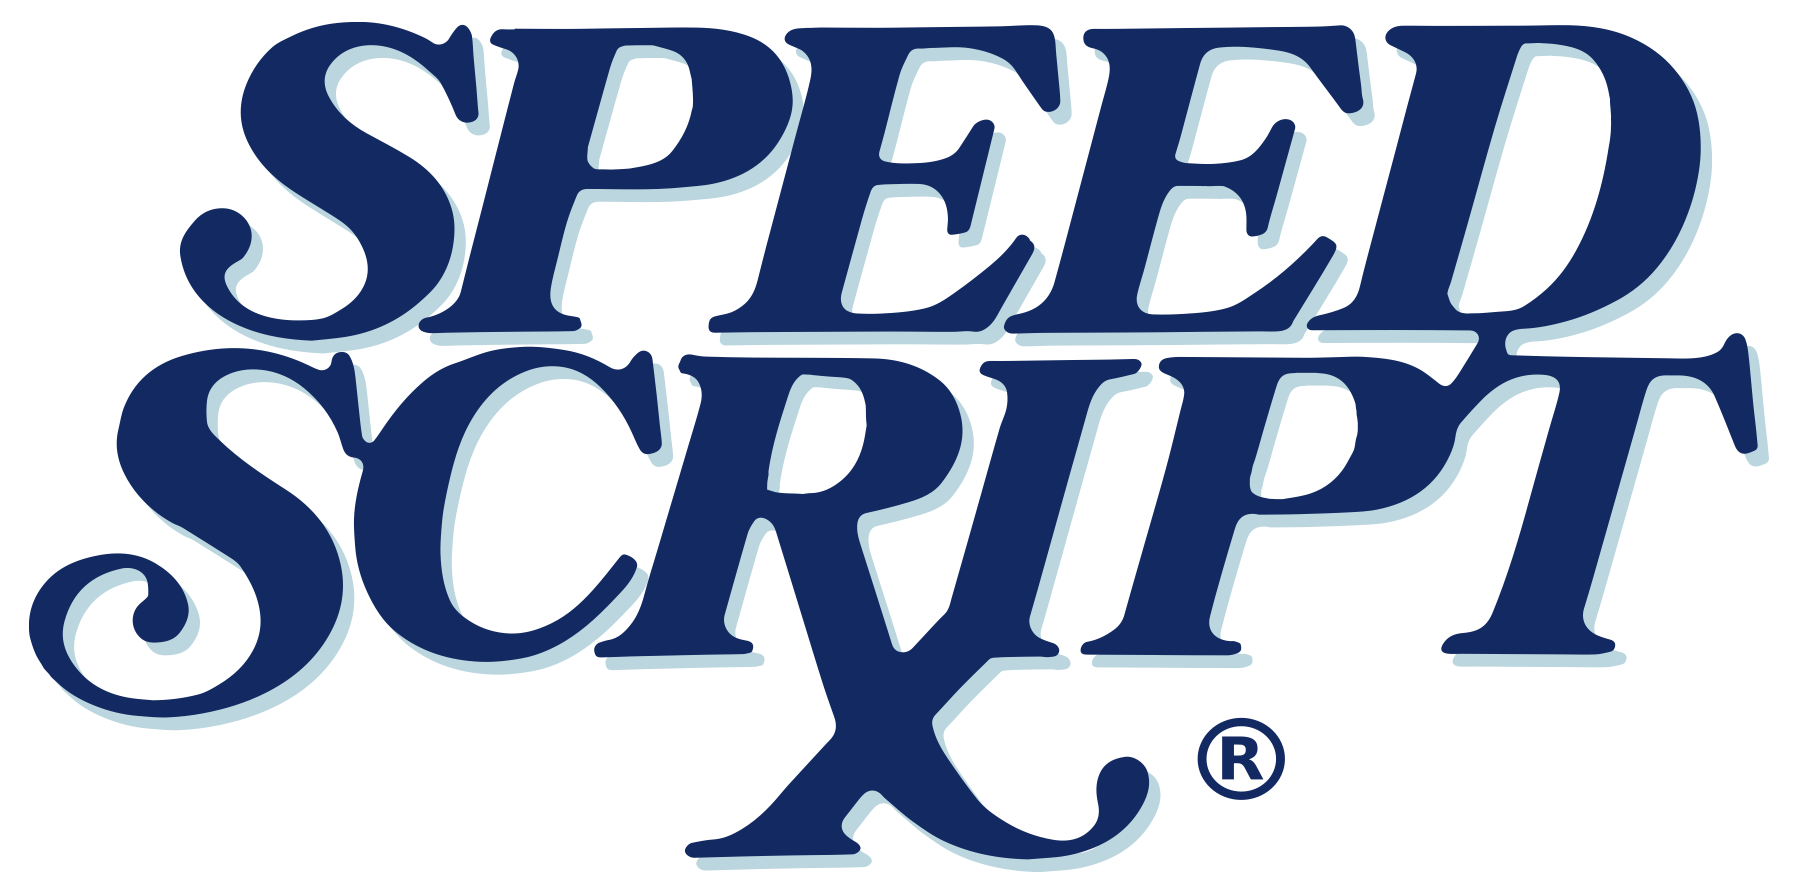 2020 Buyers Guide Logos Speed Script